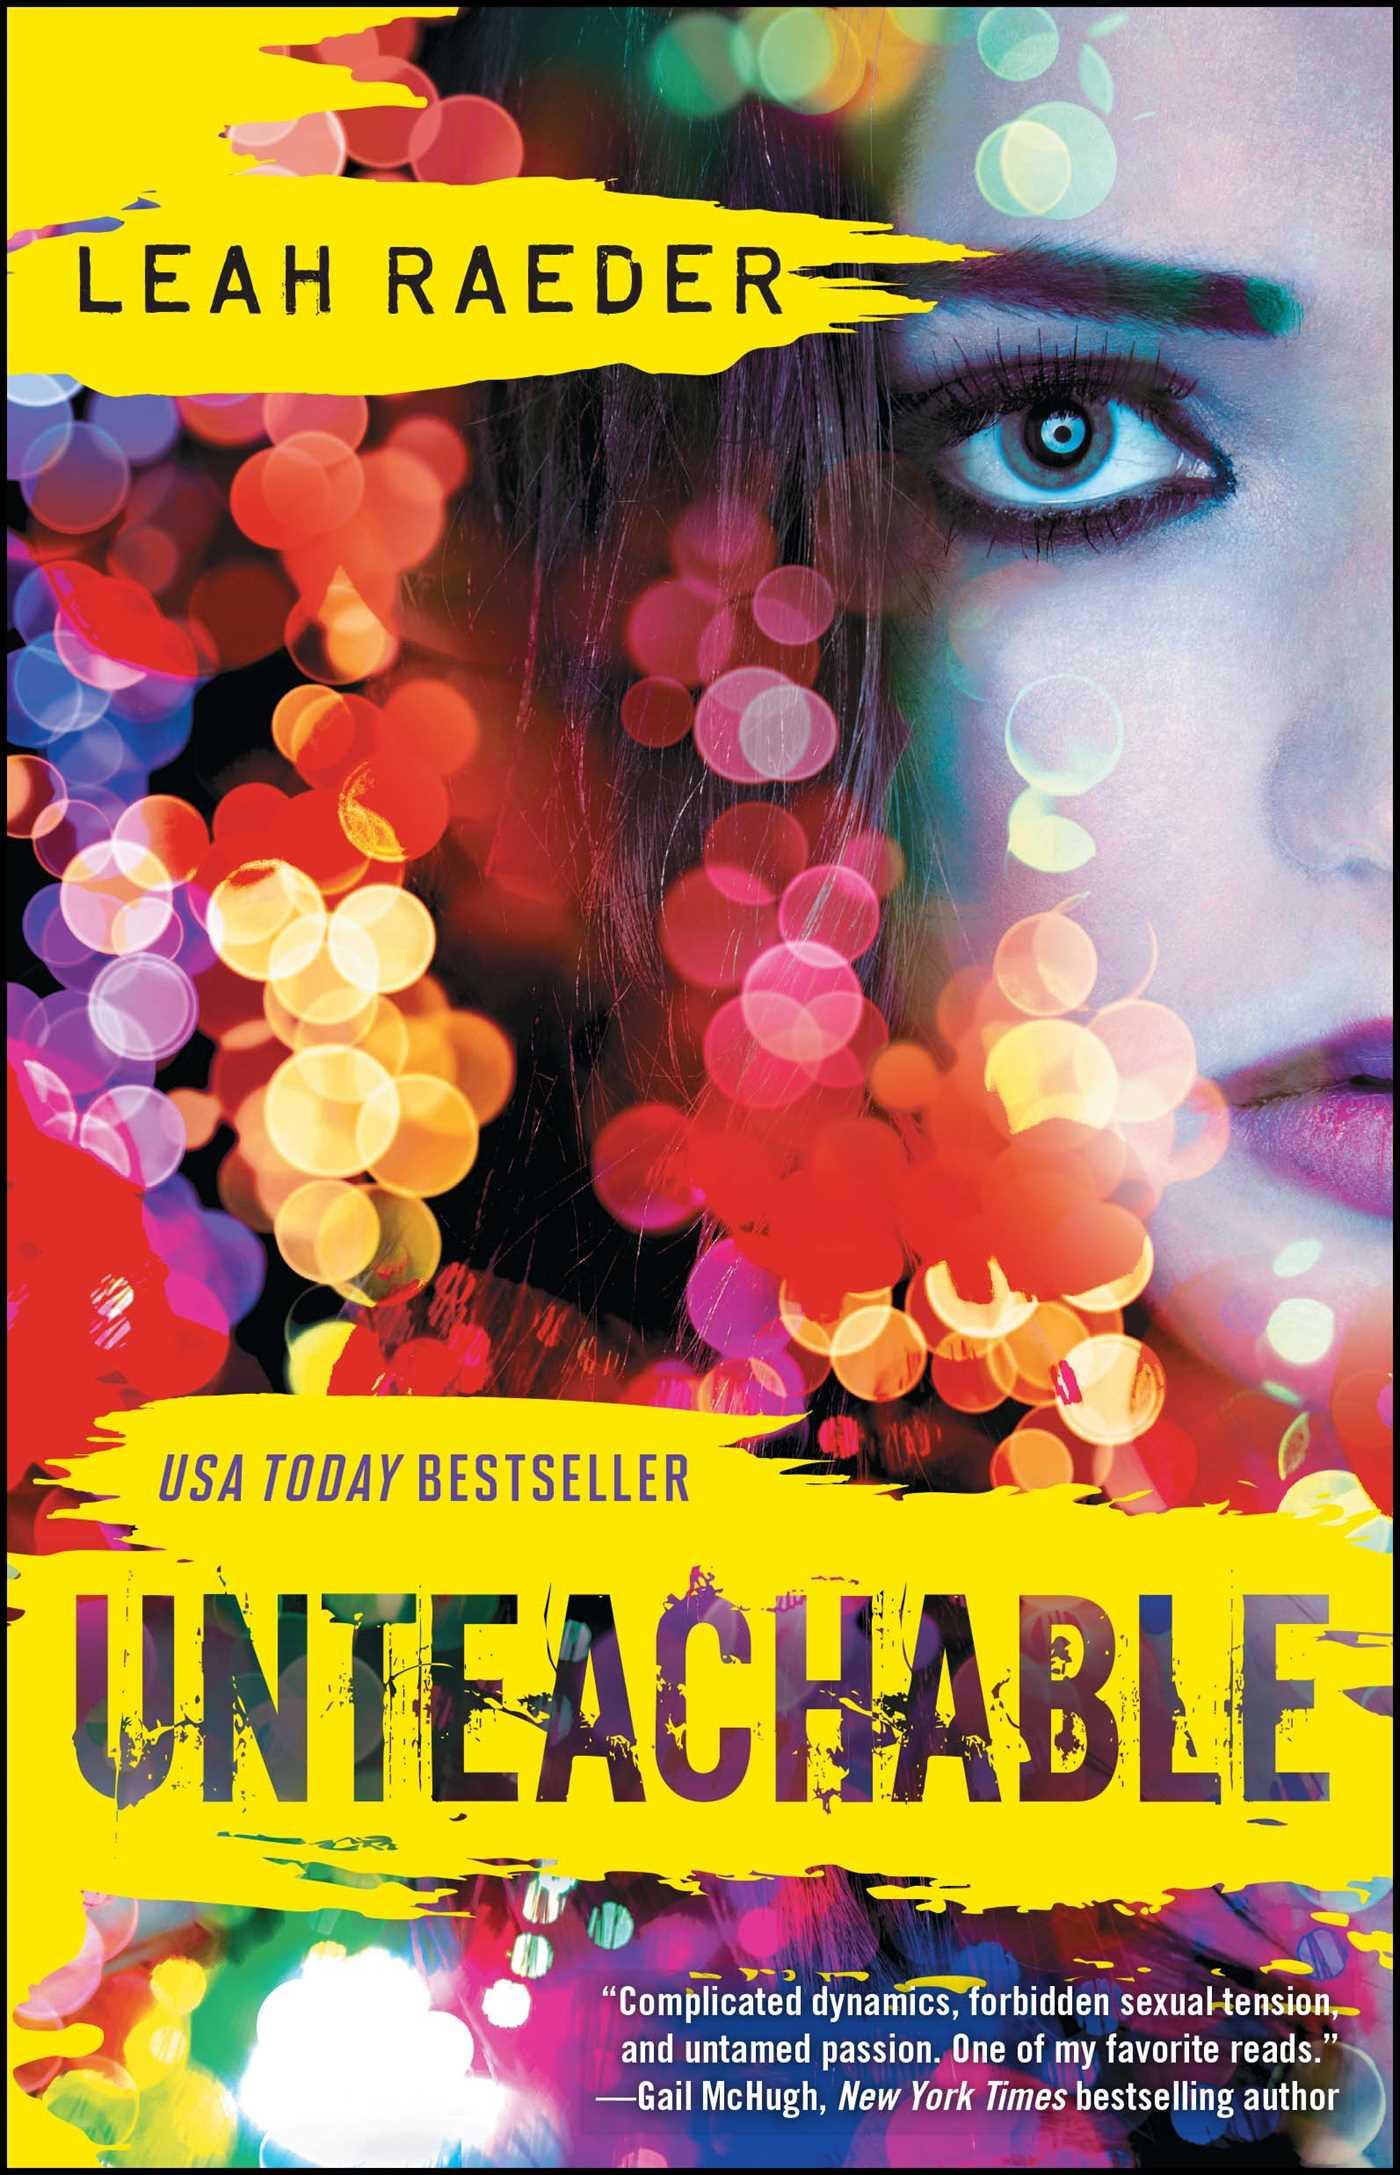 Unteachable 9781476786407 hr